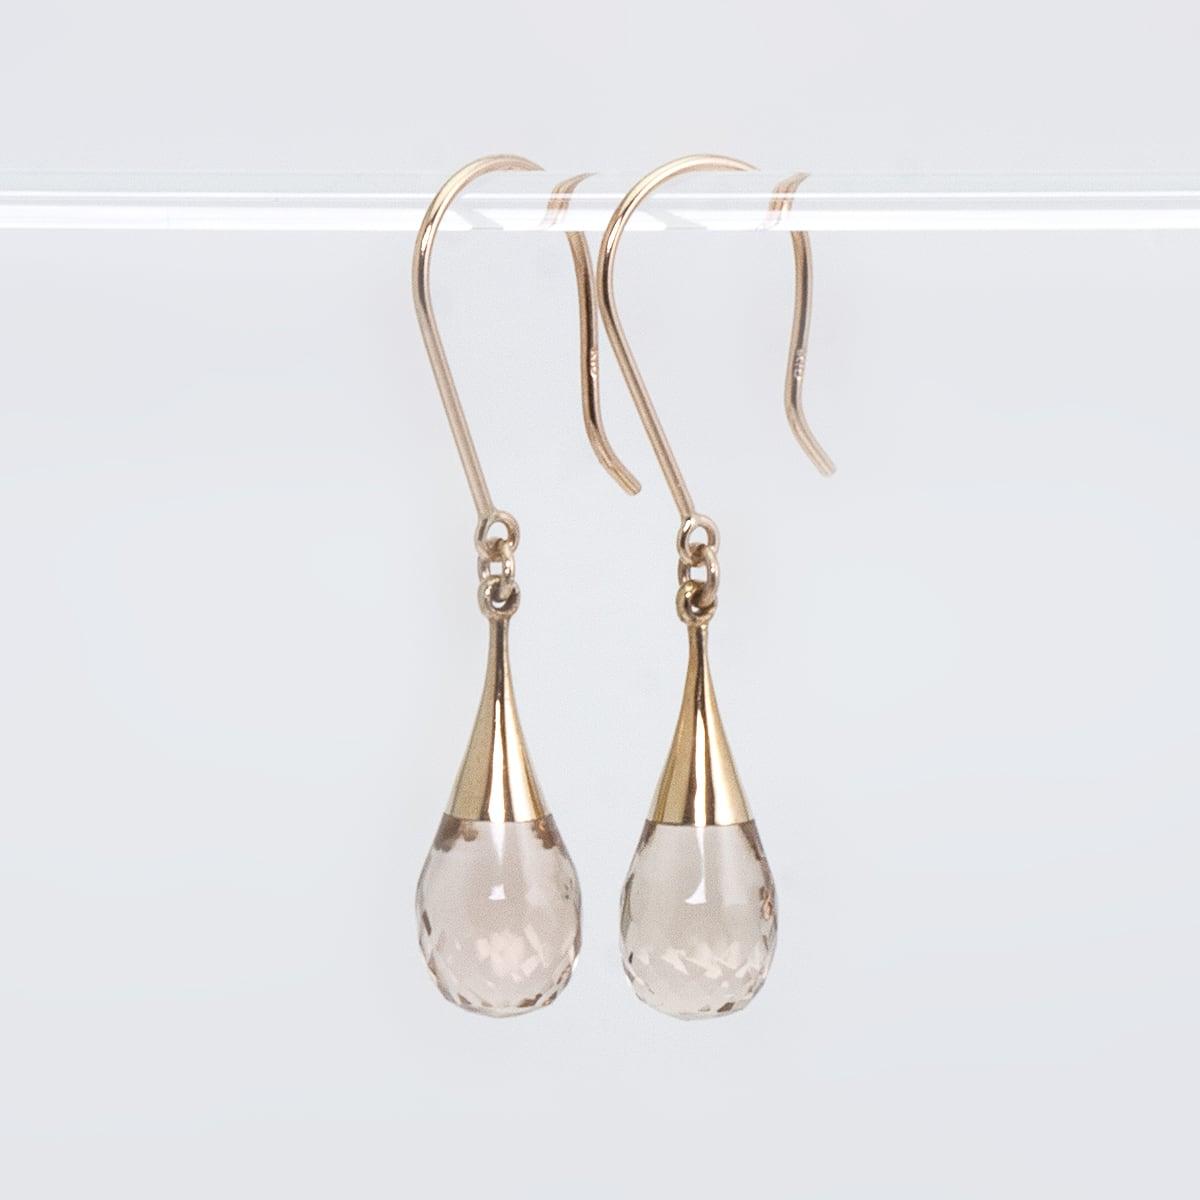 Drop earrings / Champagne quartz